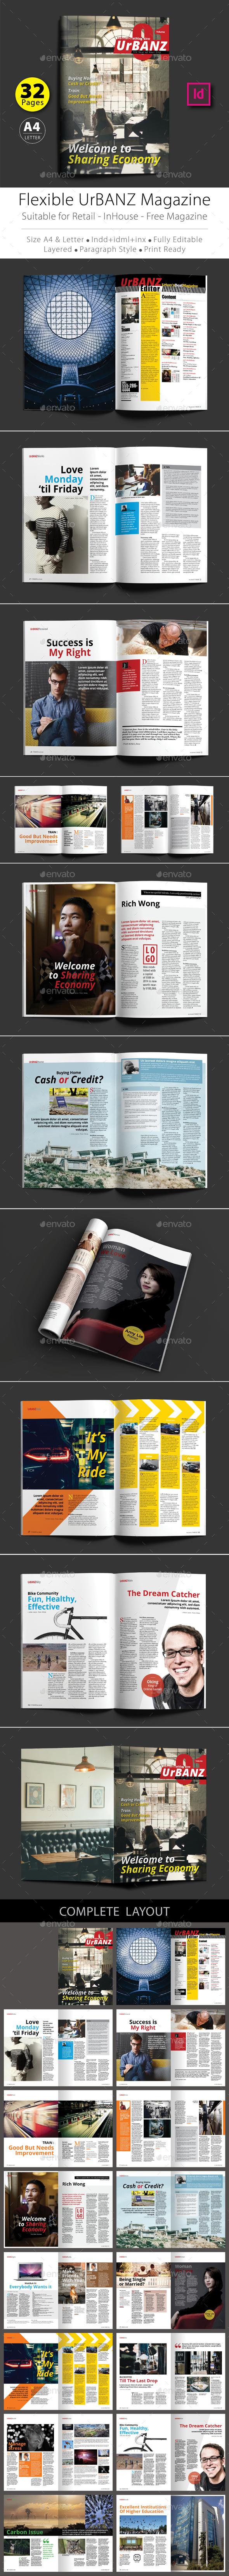 Flexible UrBANZ Magazine Template - Magazines Print Templates